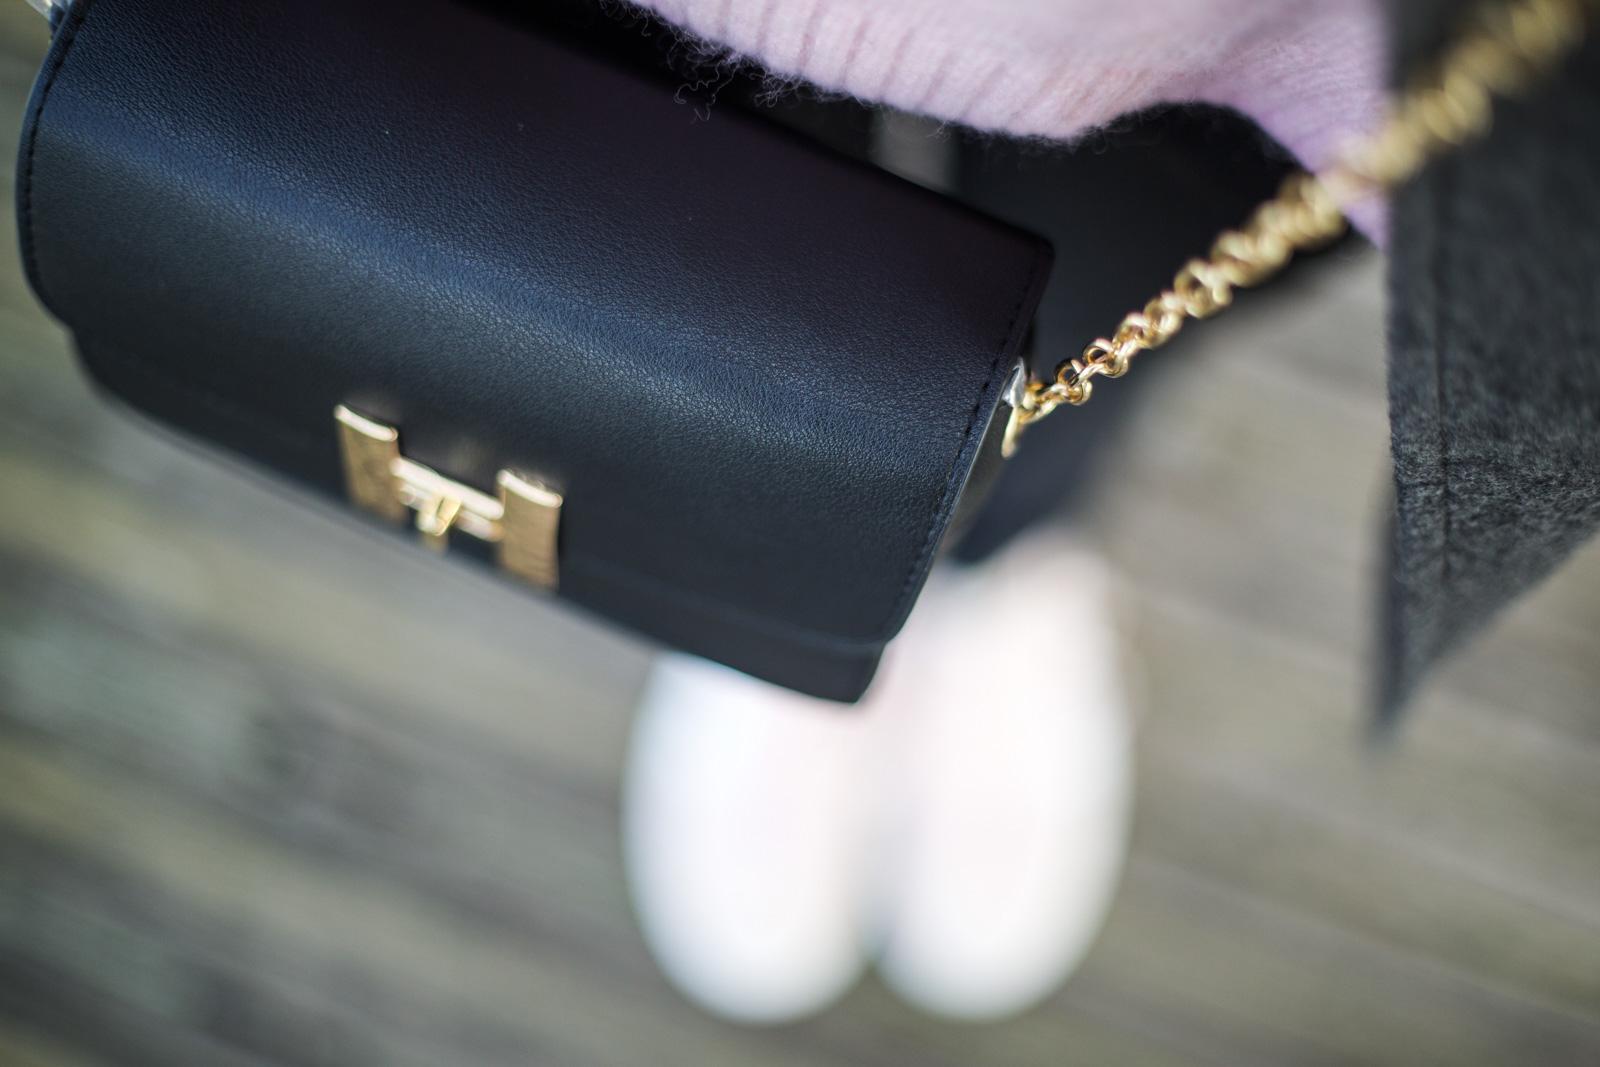 sac a main noir et or